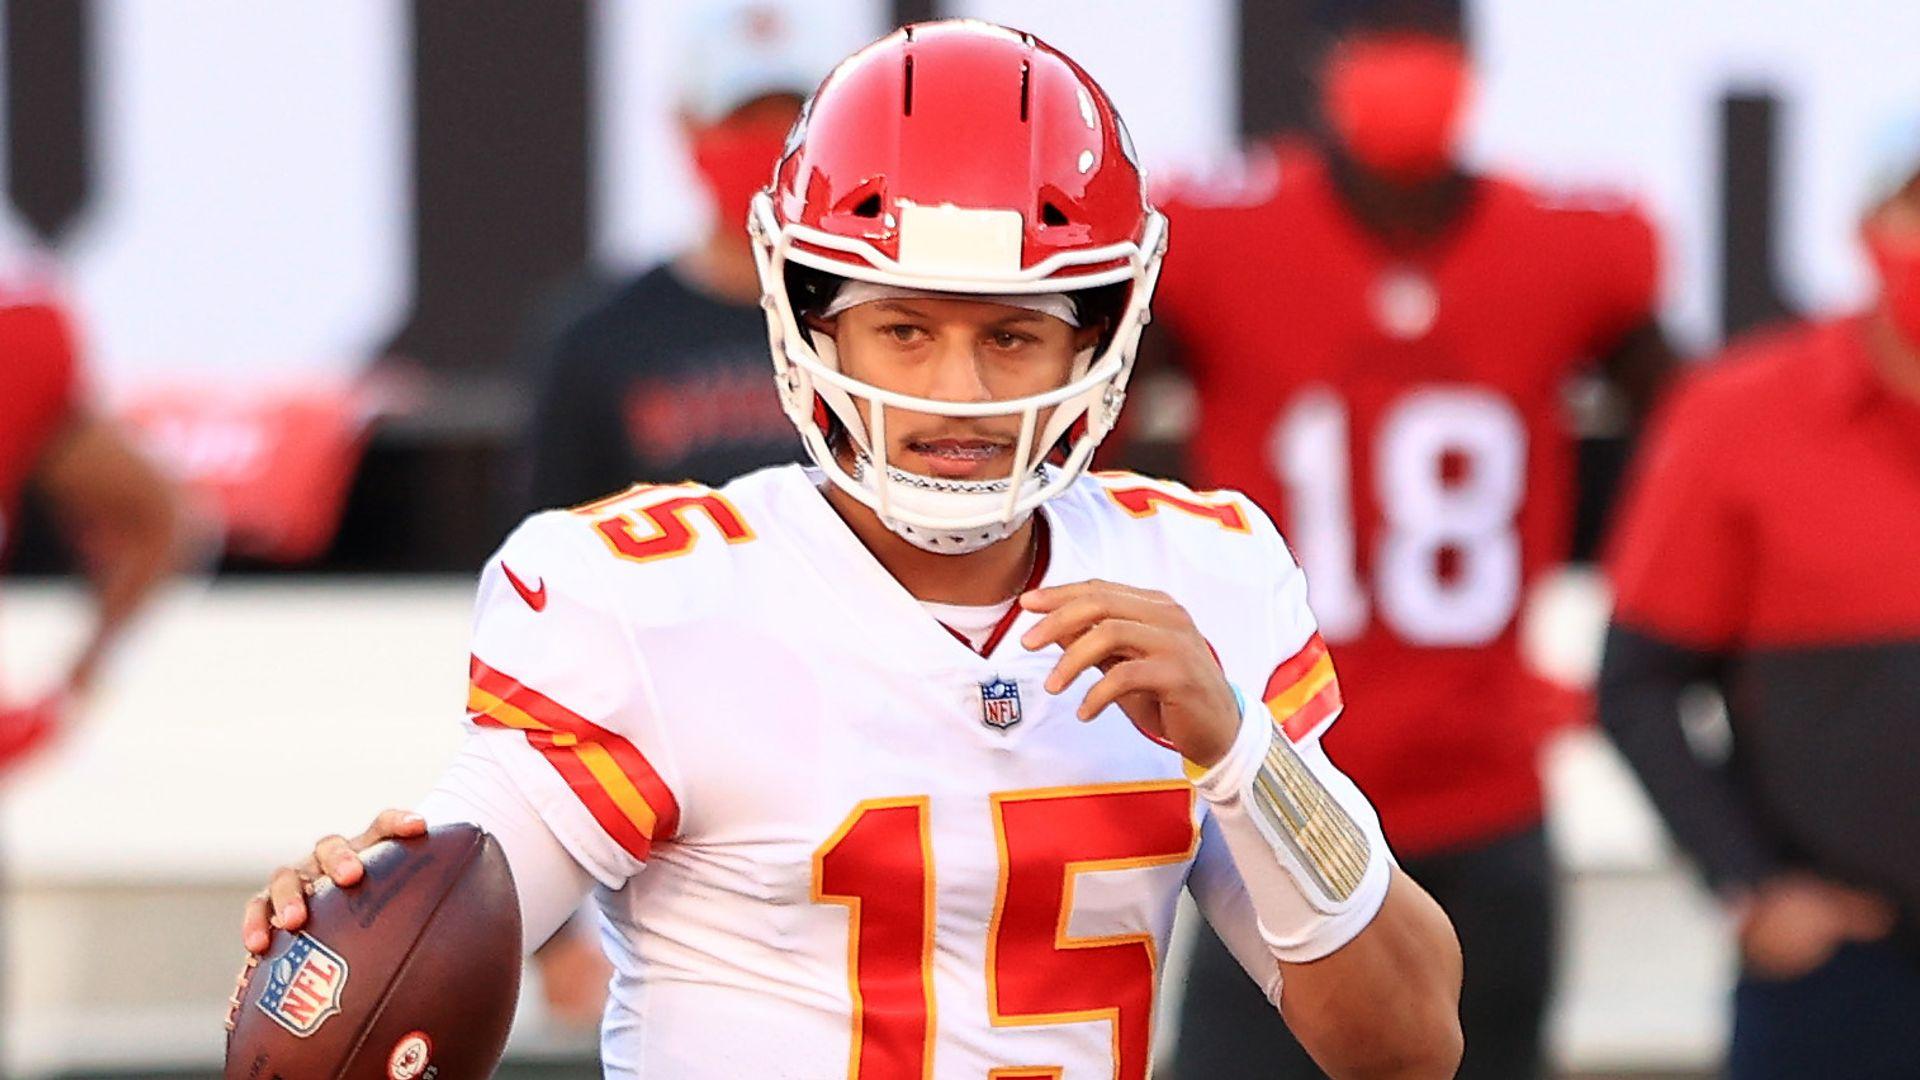 NFL Sunday: Week 12 as it happened